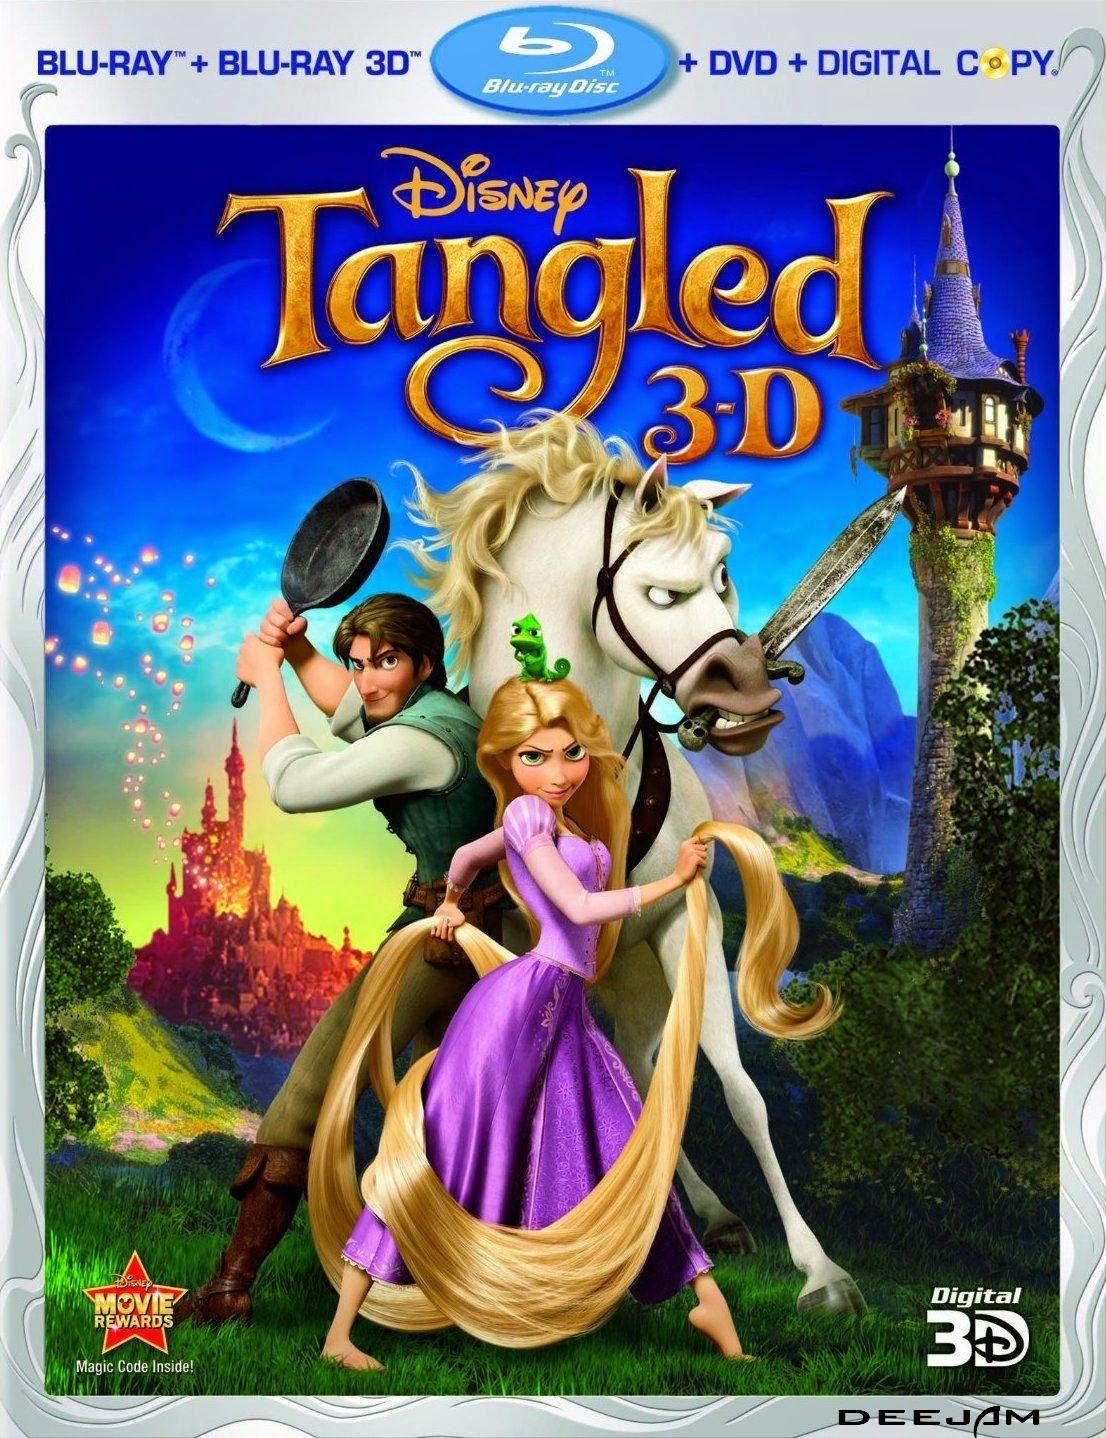 Urdu Guru Cartoon Movies Disney Movie Rewards Disney Blu Ray Blu Ray Movies